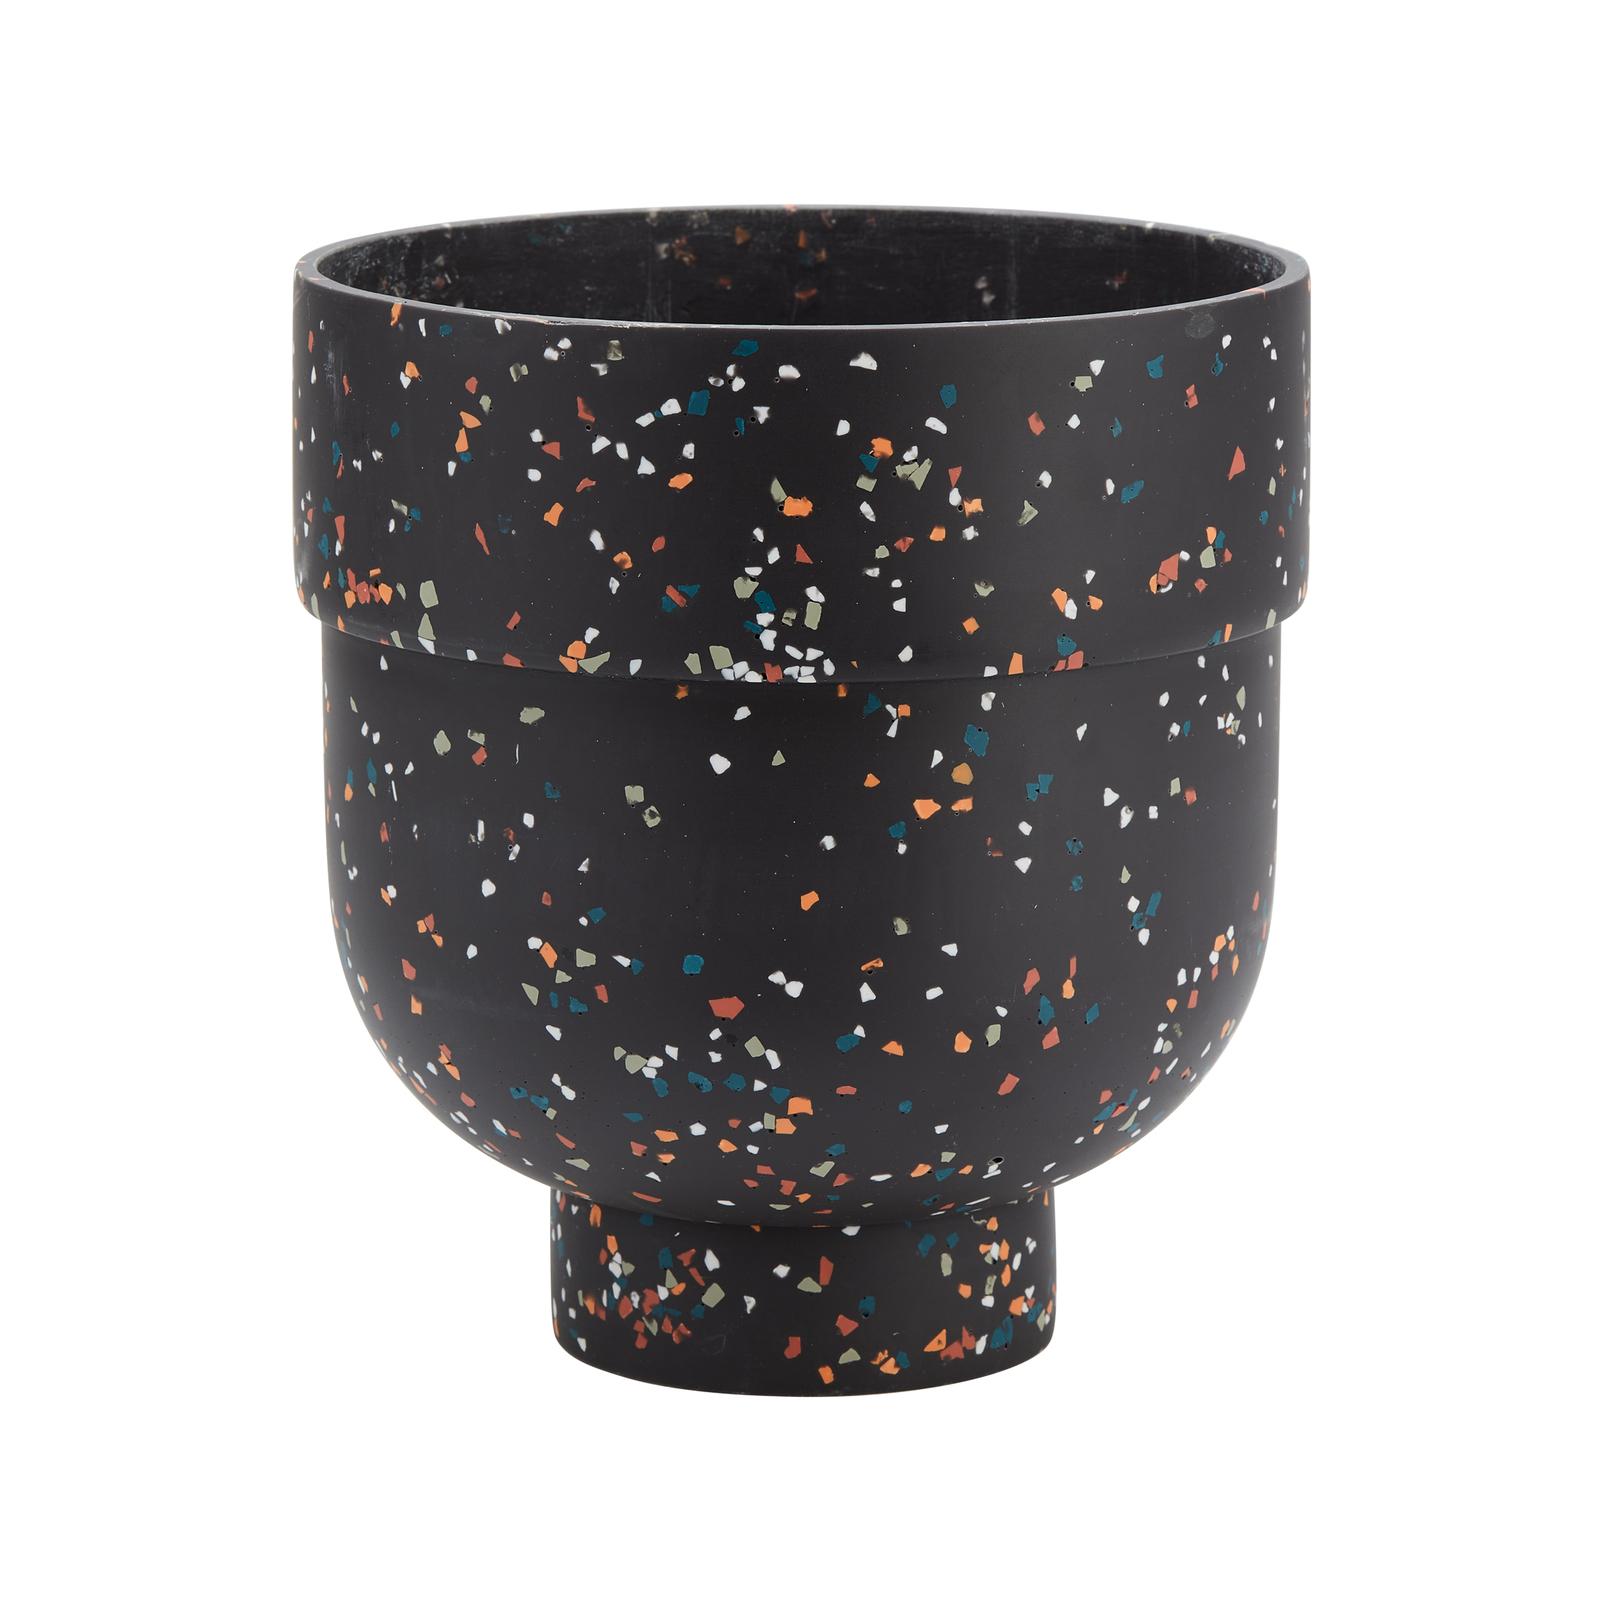 Capra 22.2 x 24.6cm Stone Funnel Terrazzo Resin Pot